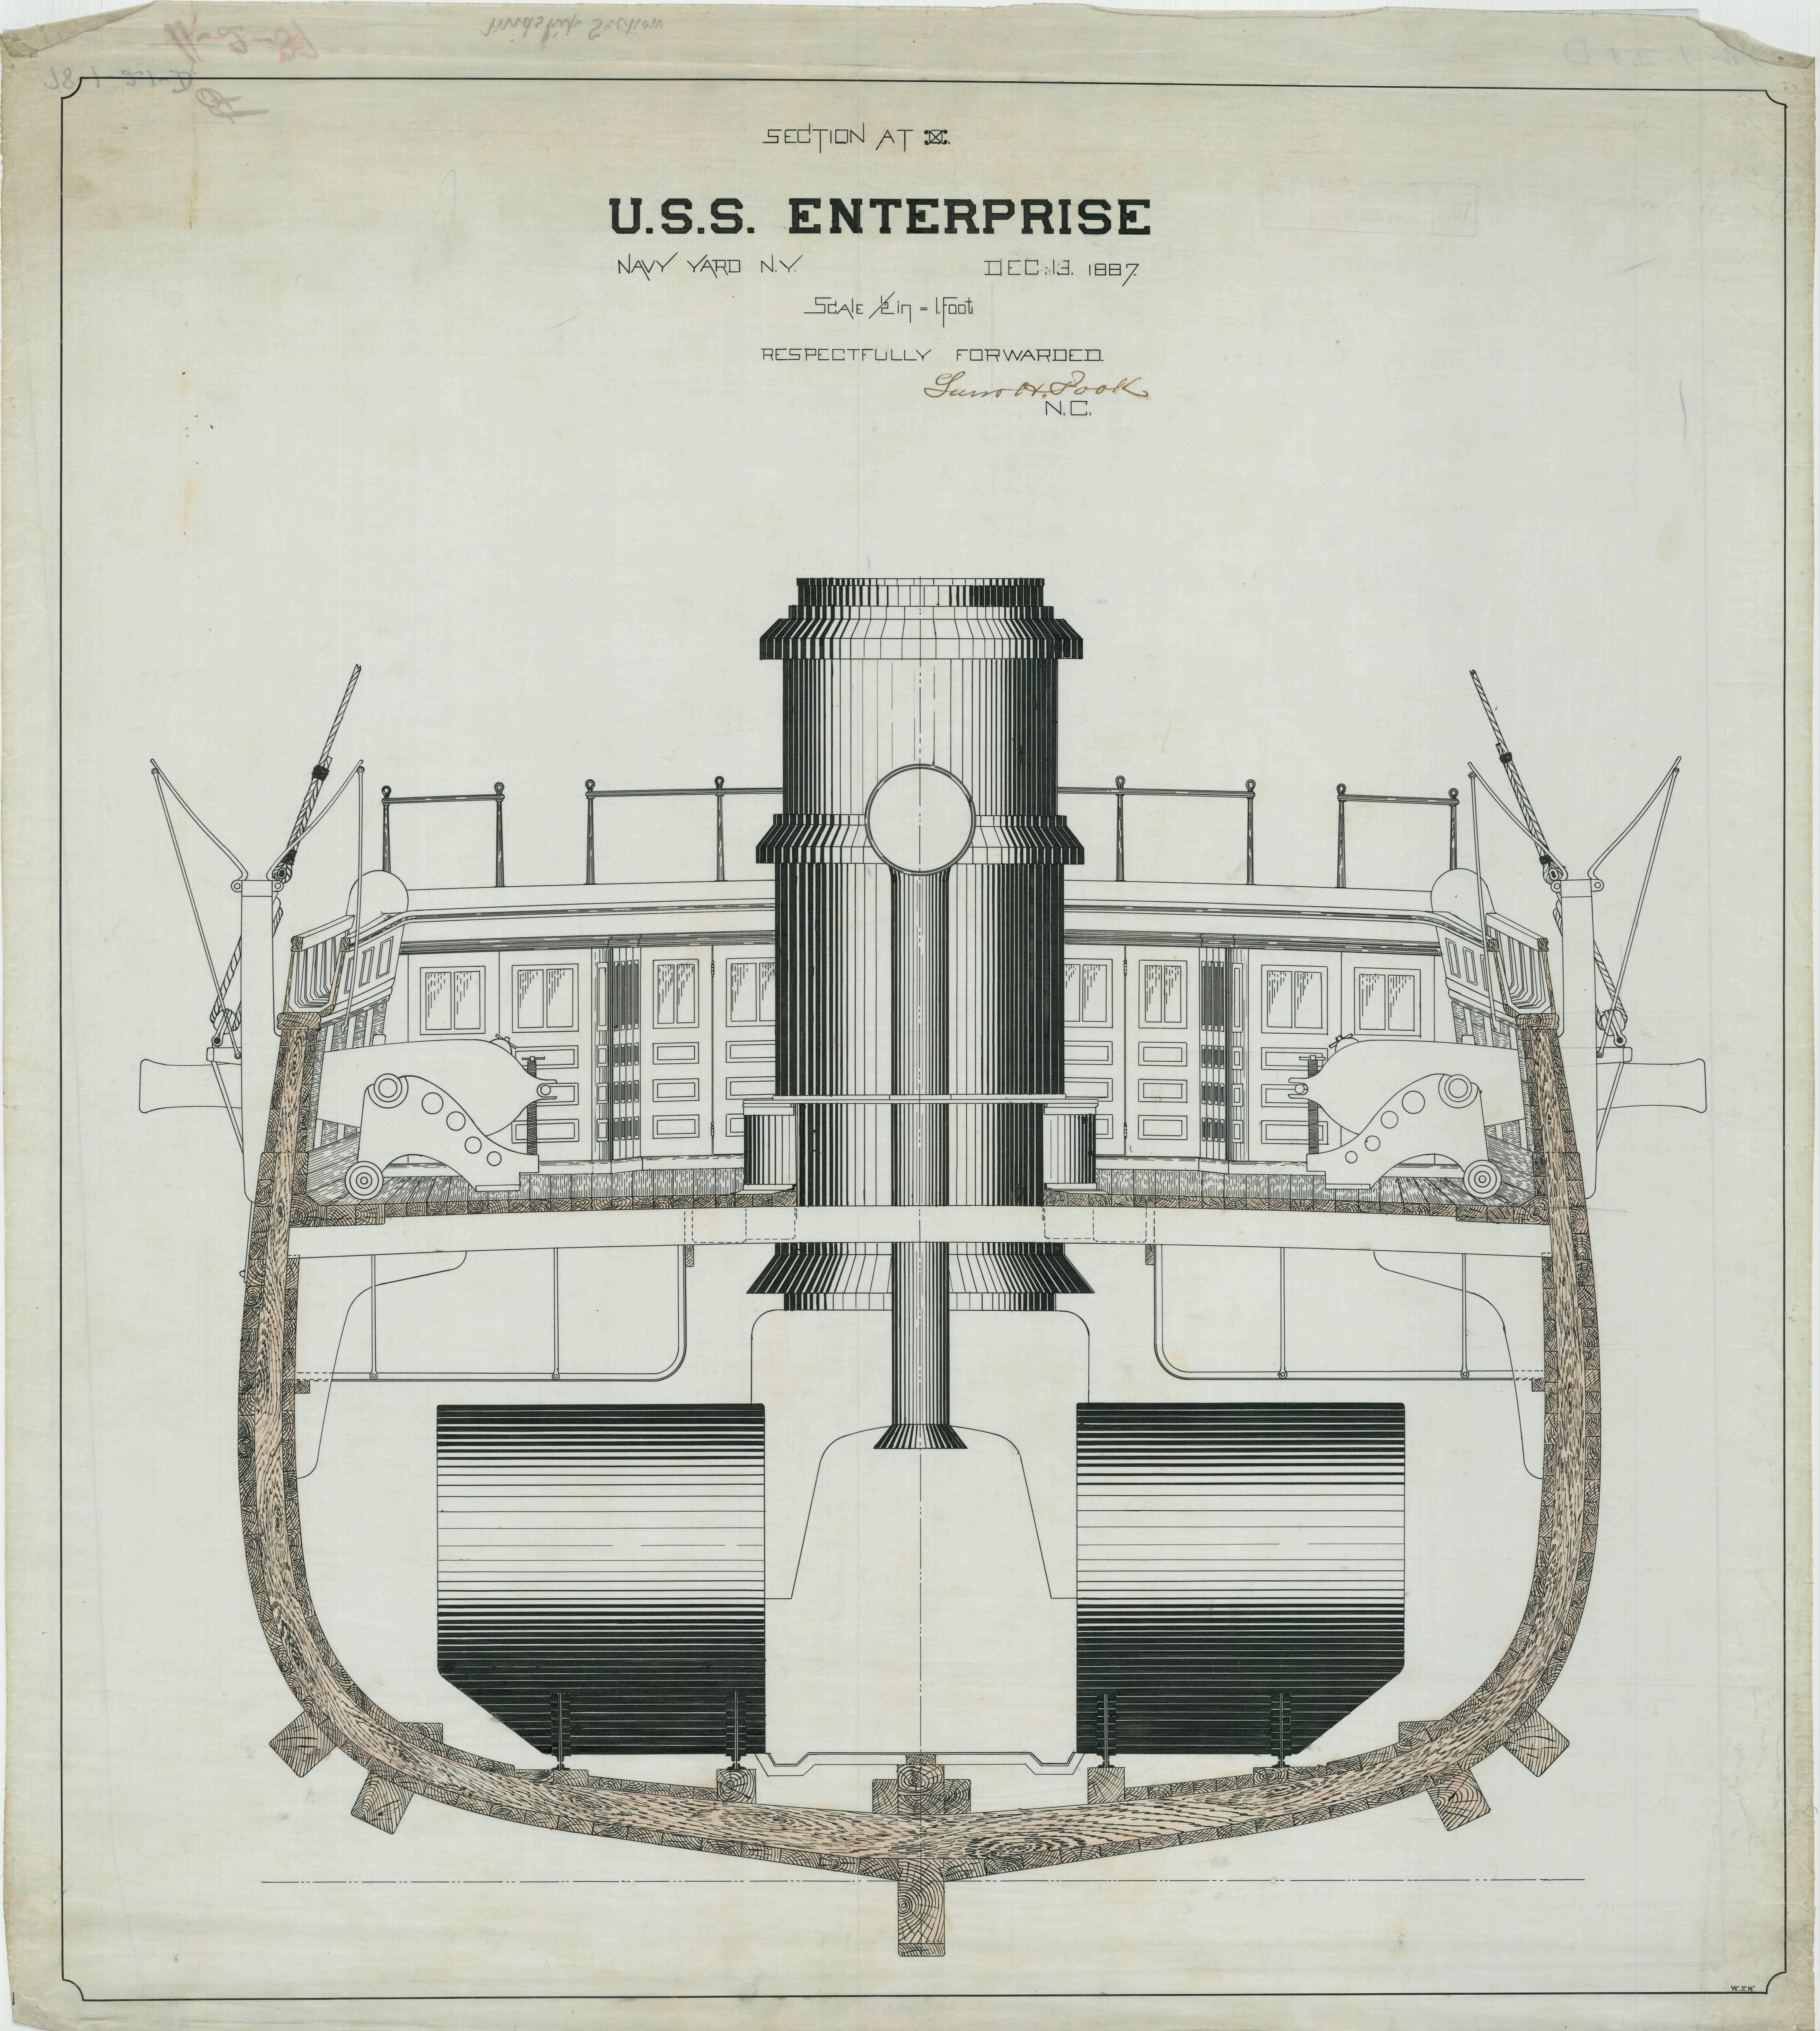 EnterpriseCross1887